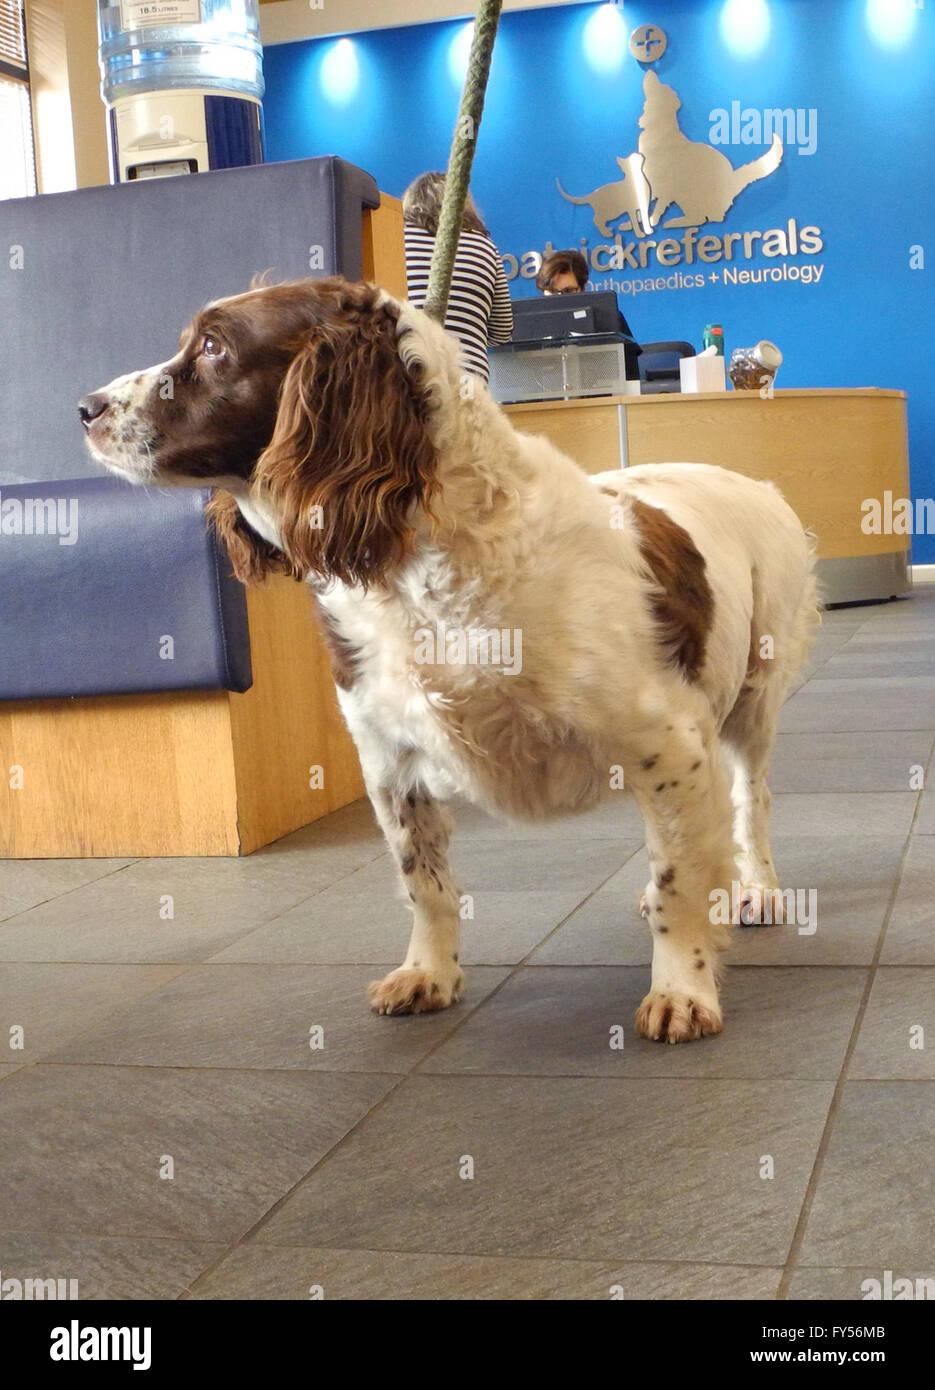 Dog at the Vets. 'Meg' at Fitzpatrick Referrals. Not happy !   Springer spaniel 'Meg' on visit to - Stock Image